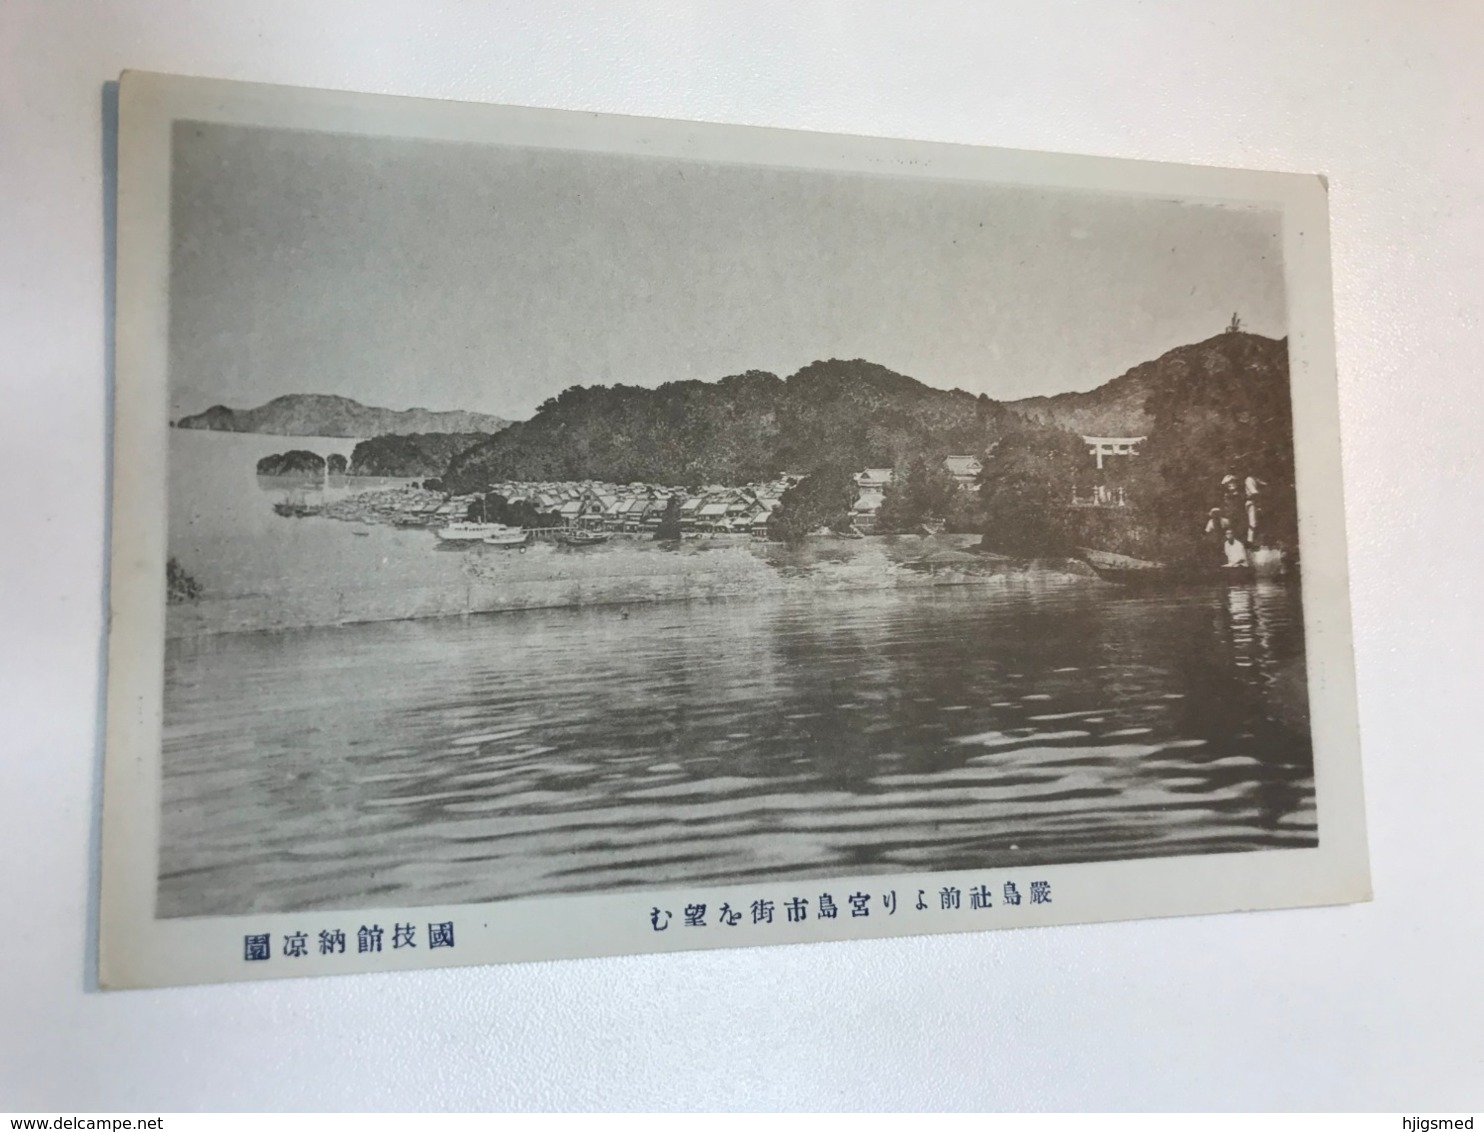 Asia Japan Japanese Card Shrine Ship Boat Dock Shore Tree Men 11474 Post Card Postkarte POSTCARD - Zonder Classificatie